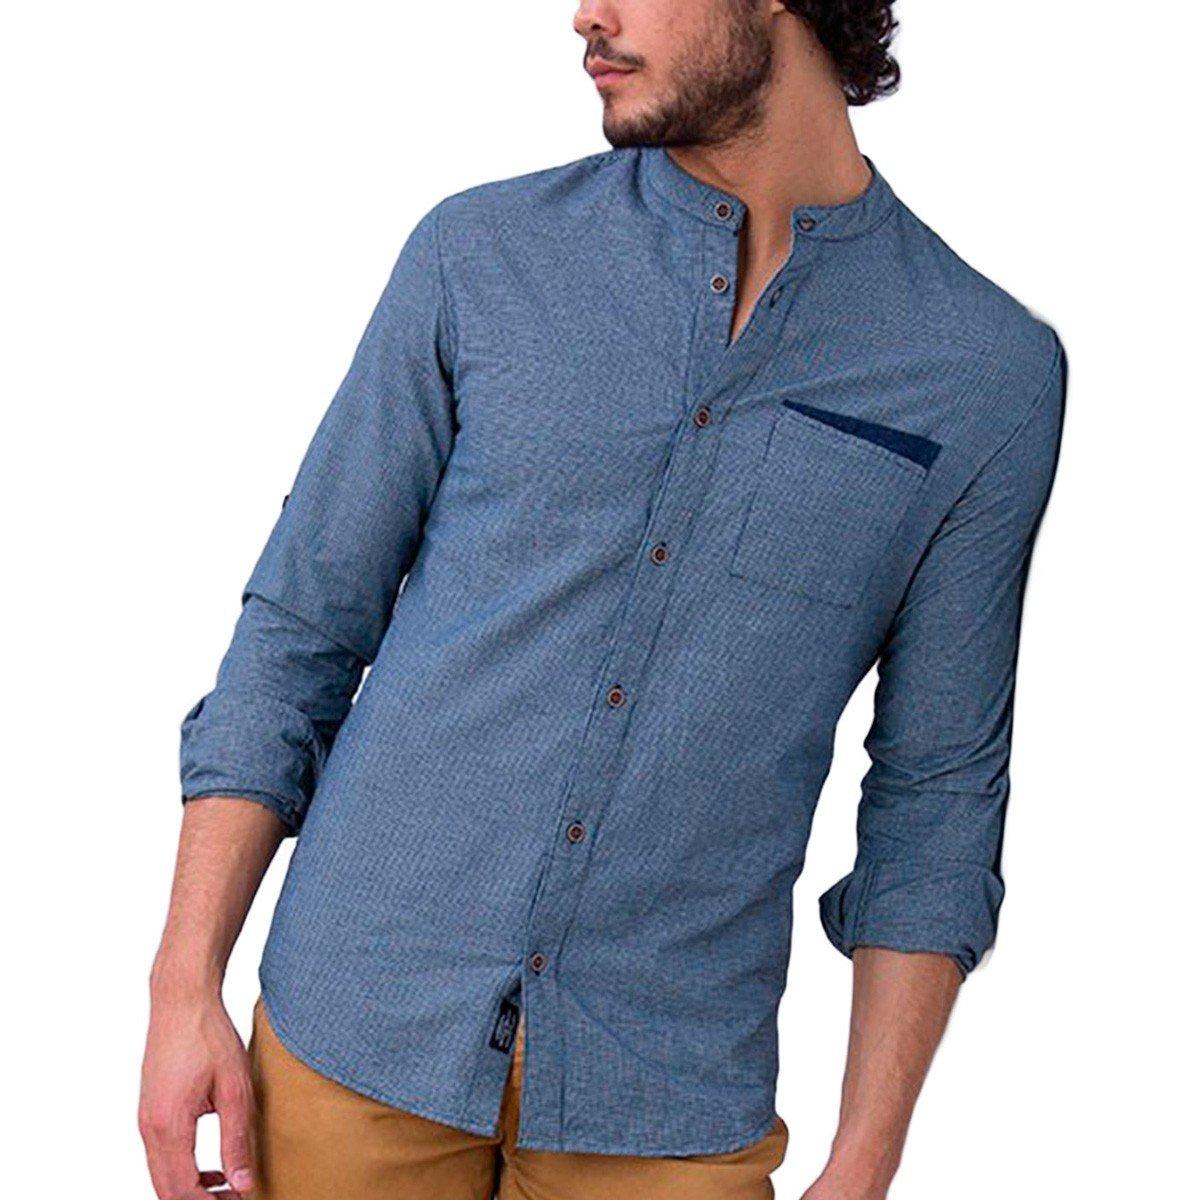 TALLA L. Tiffosi Seychelles Camisa para Hombre